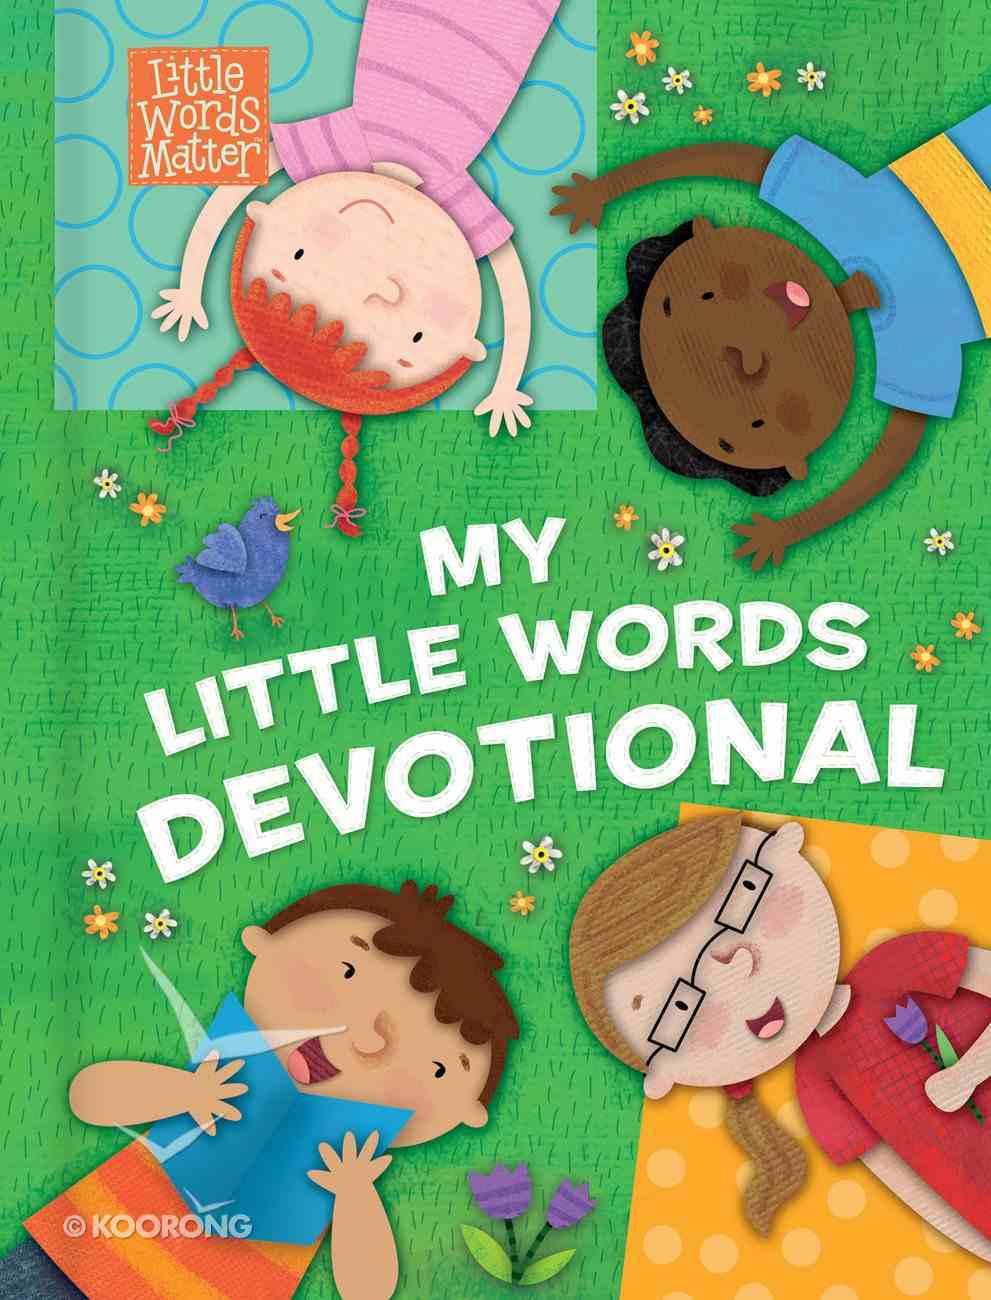 My Little Words Devotional (Little Words Matter Series) eBook